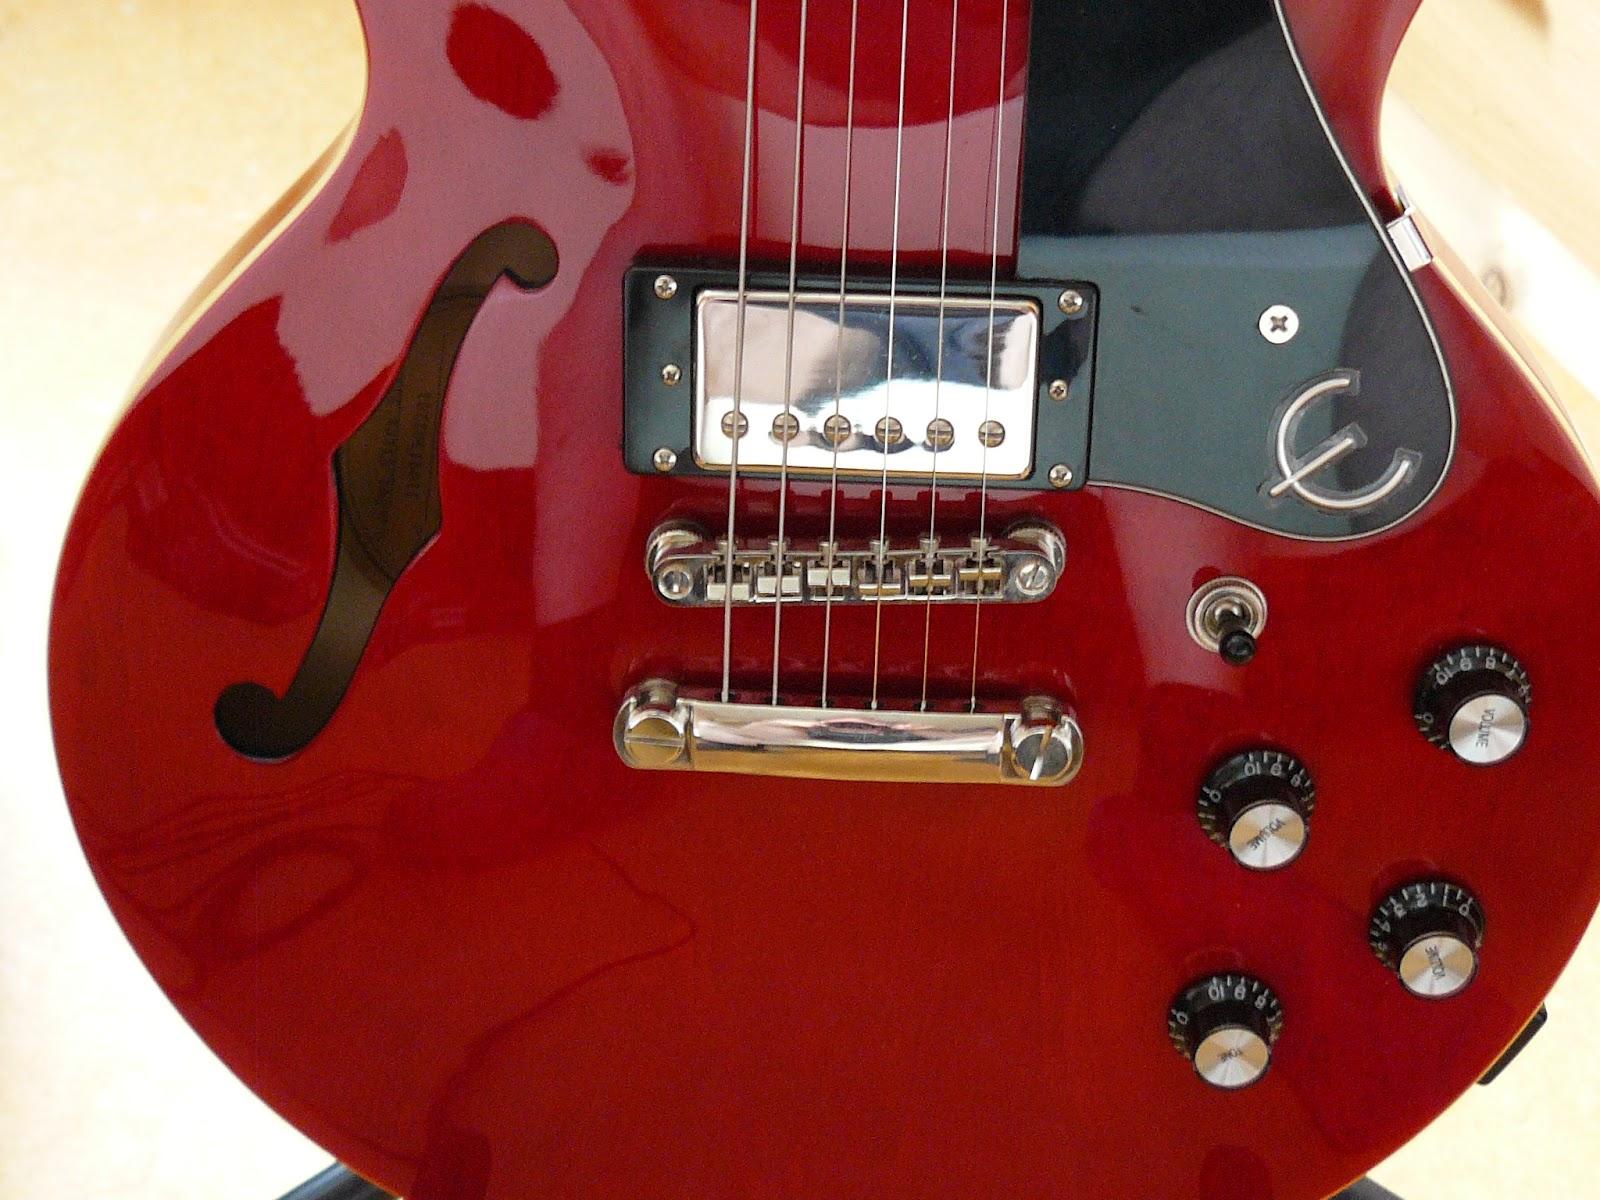 guitar leaks epiphone es 339 ultra review the bad. Black Bedroom Furniture Sets. Home Design Ideas